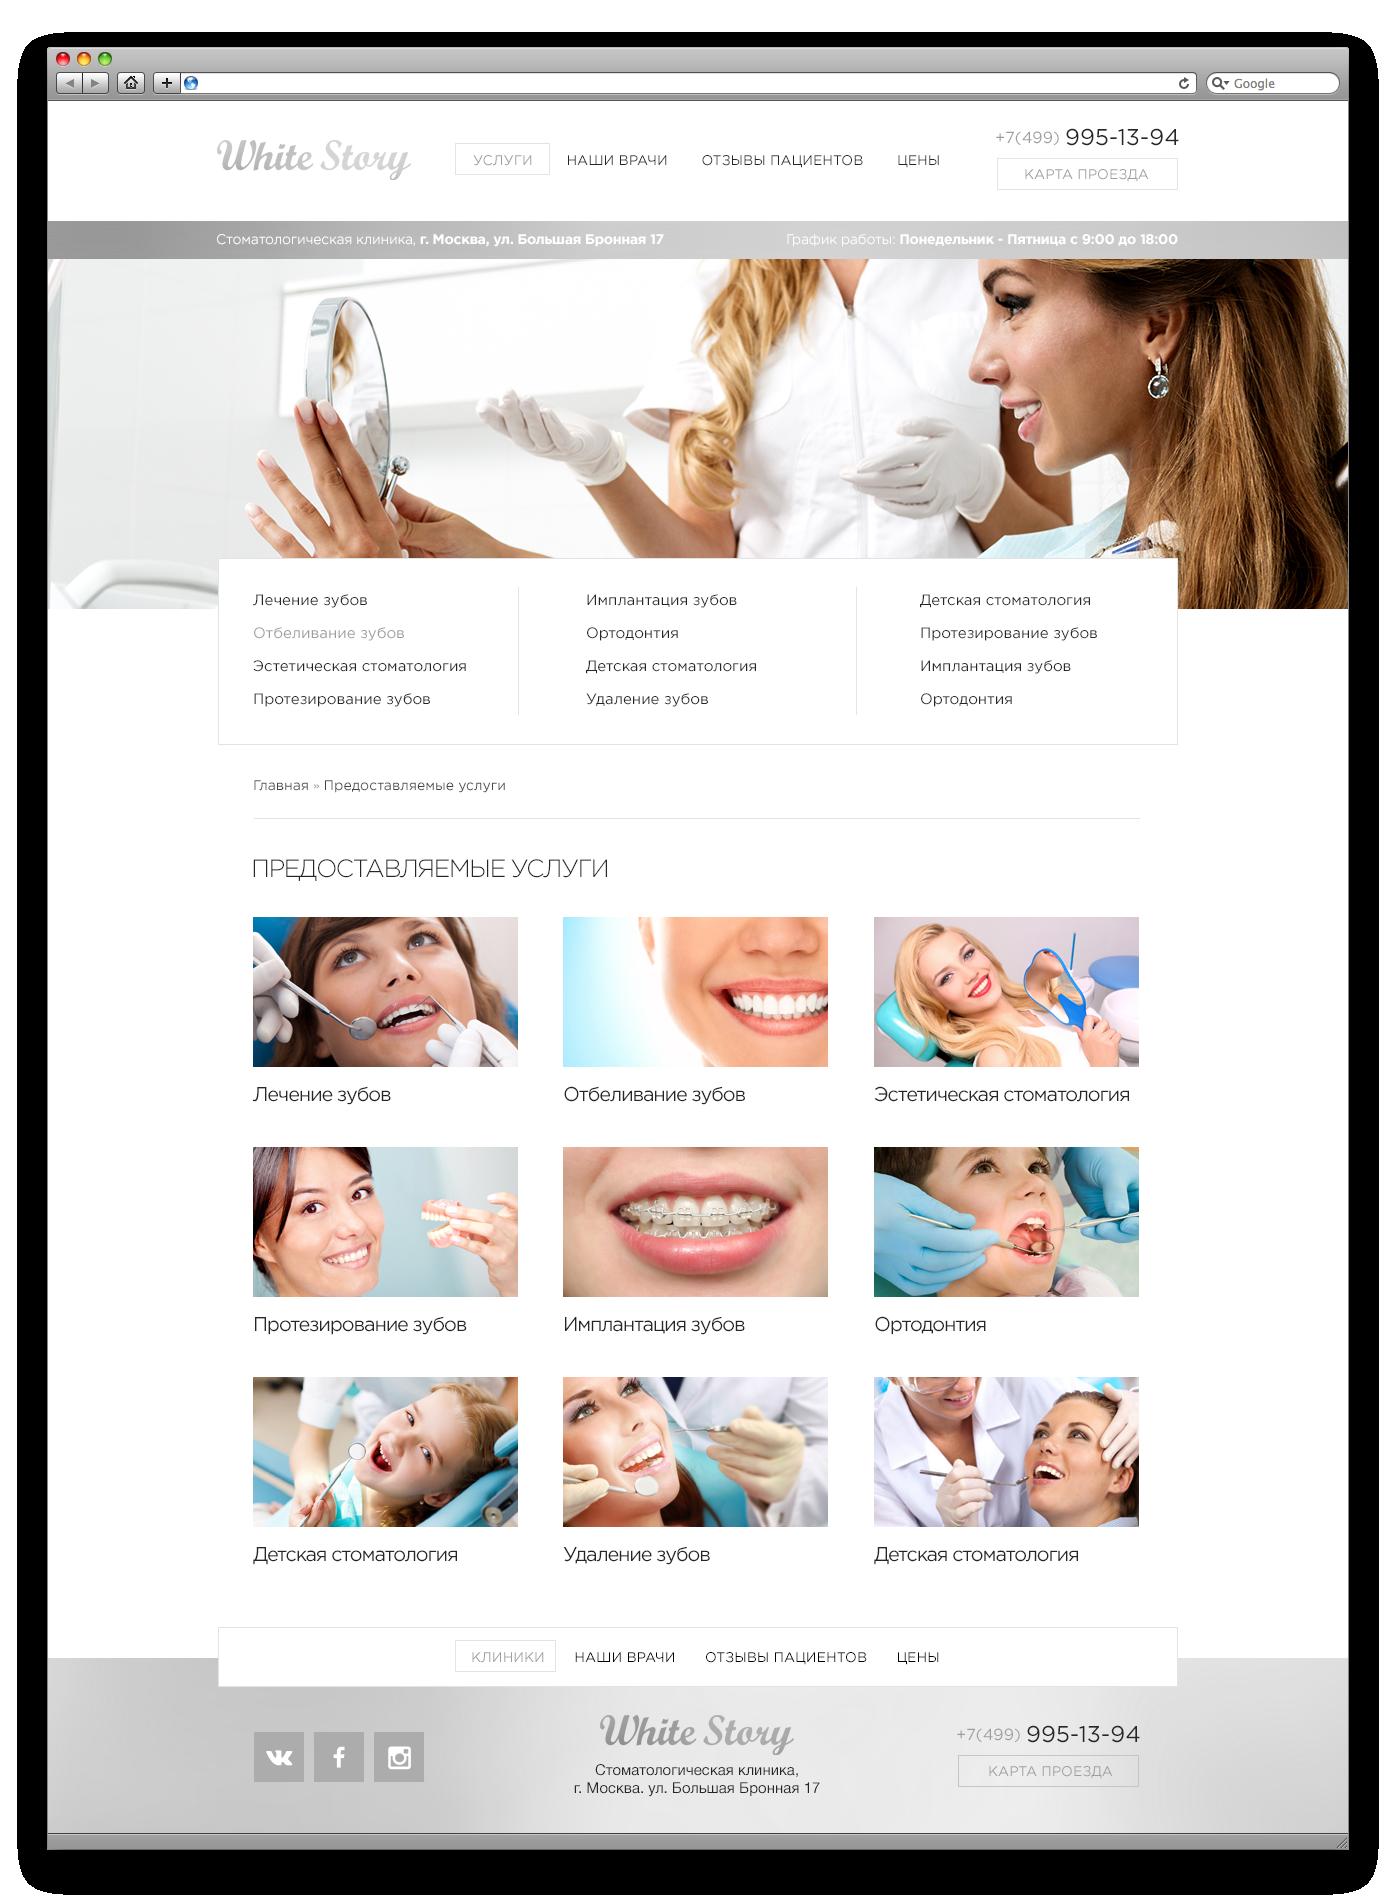 Сайт стоматологической клиники «White Story»